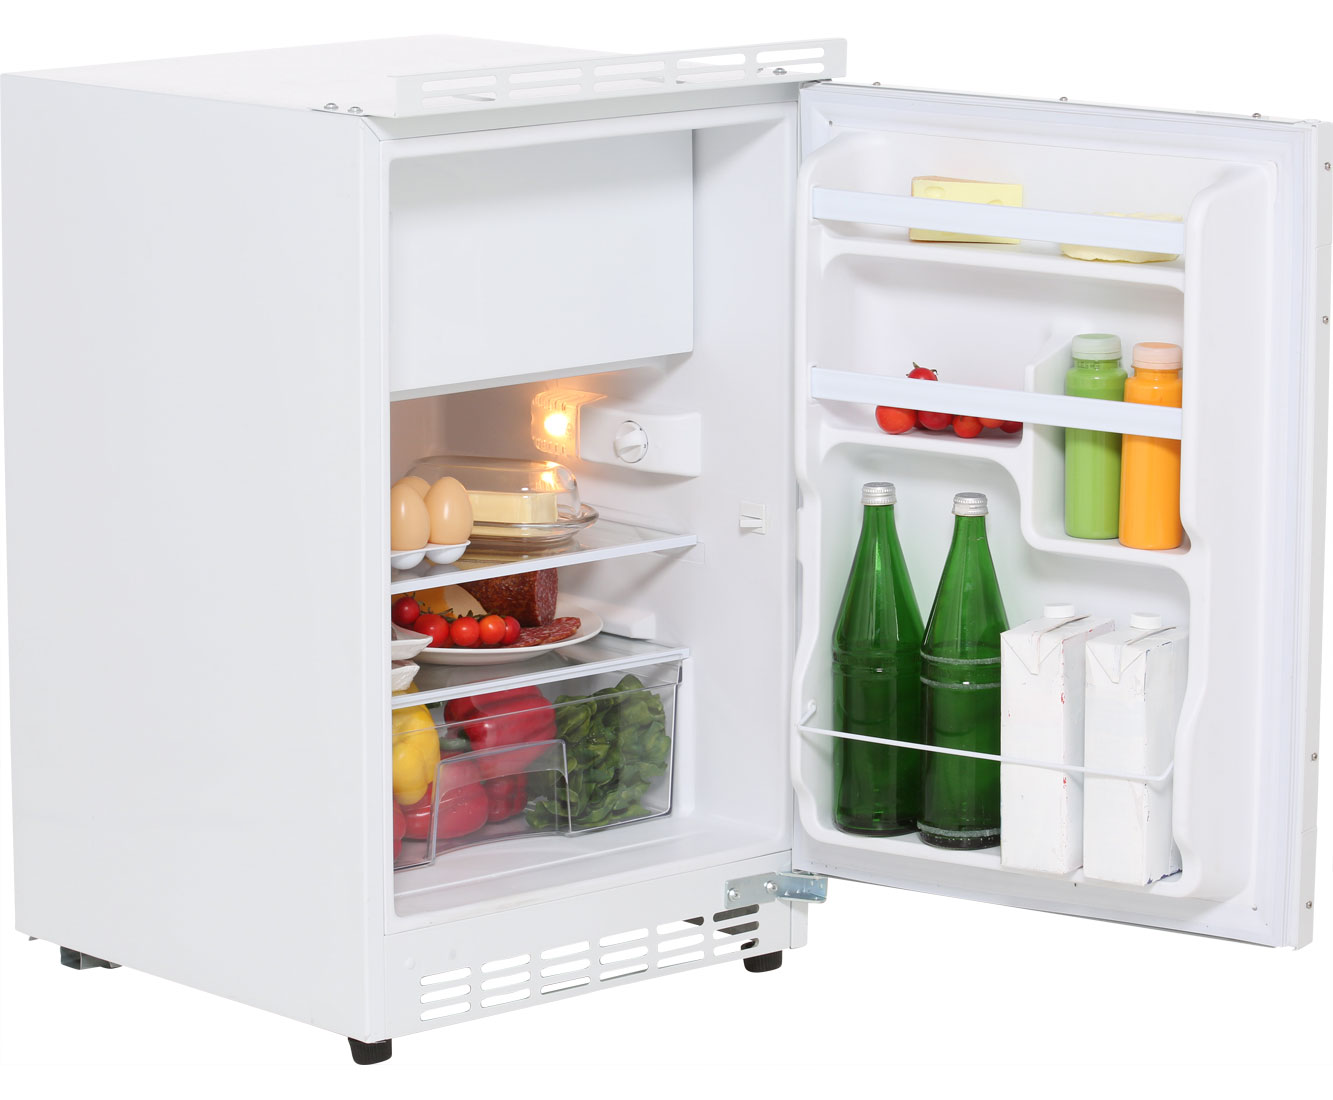 Gorenje Kühlschrank Unterbaufähig : Gorenje ru a kühlschrank unterbau cm weiss neu ebay